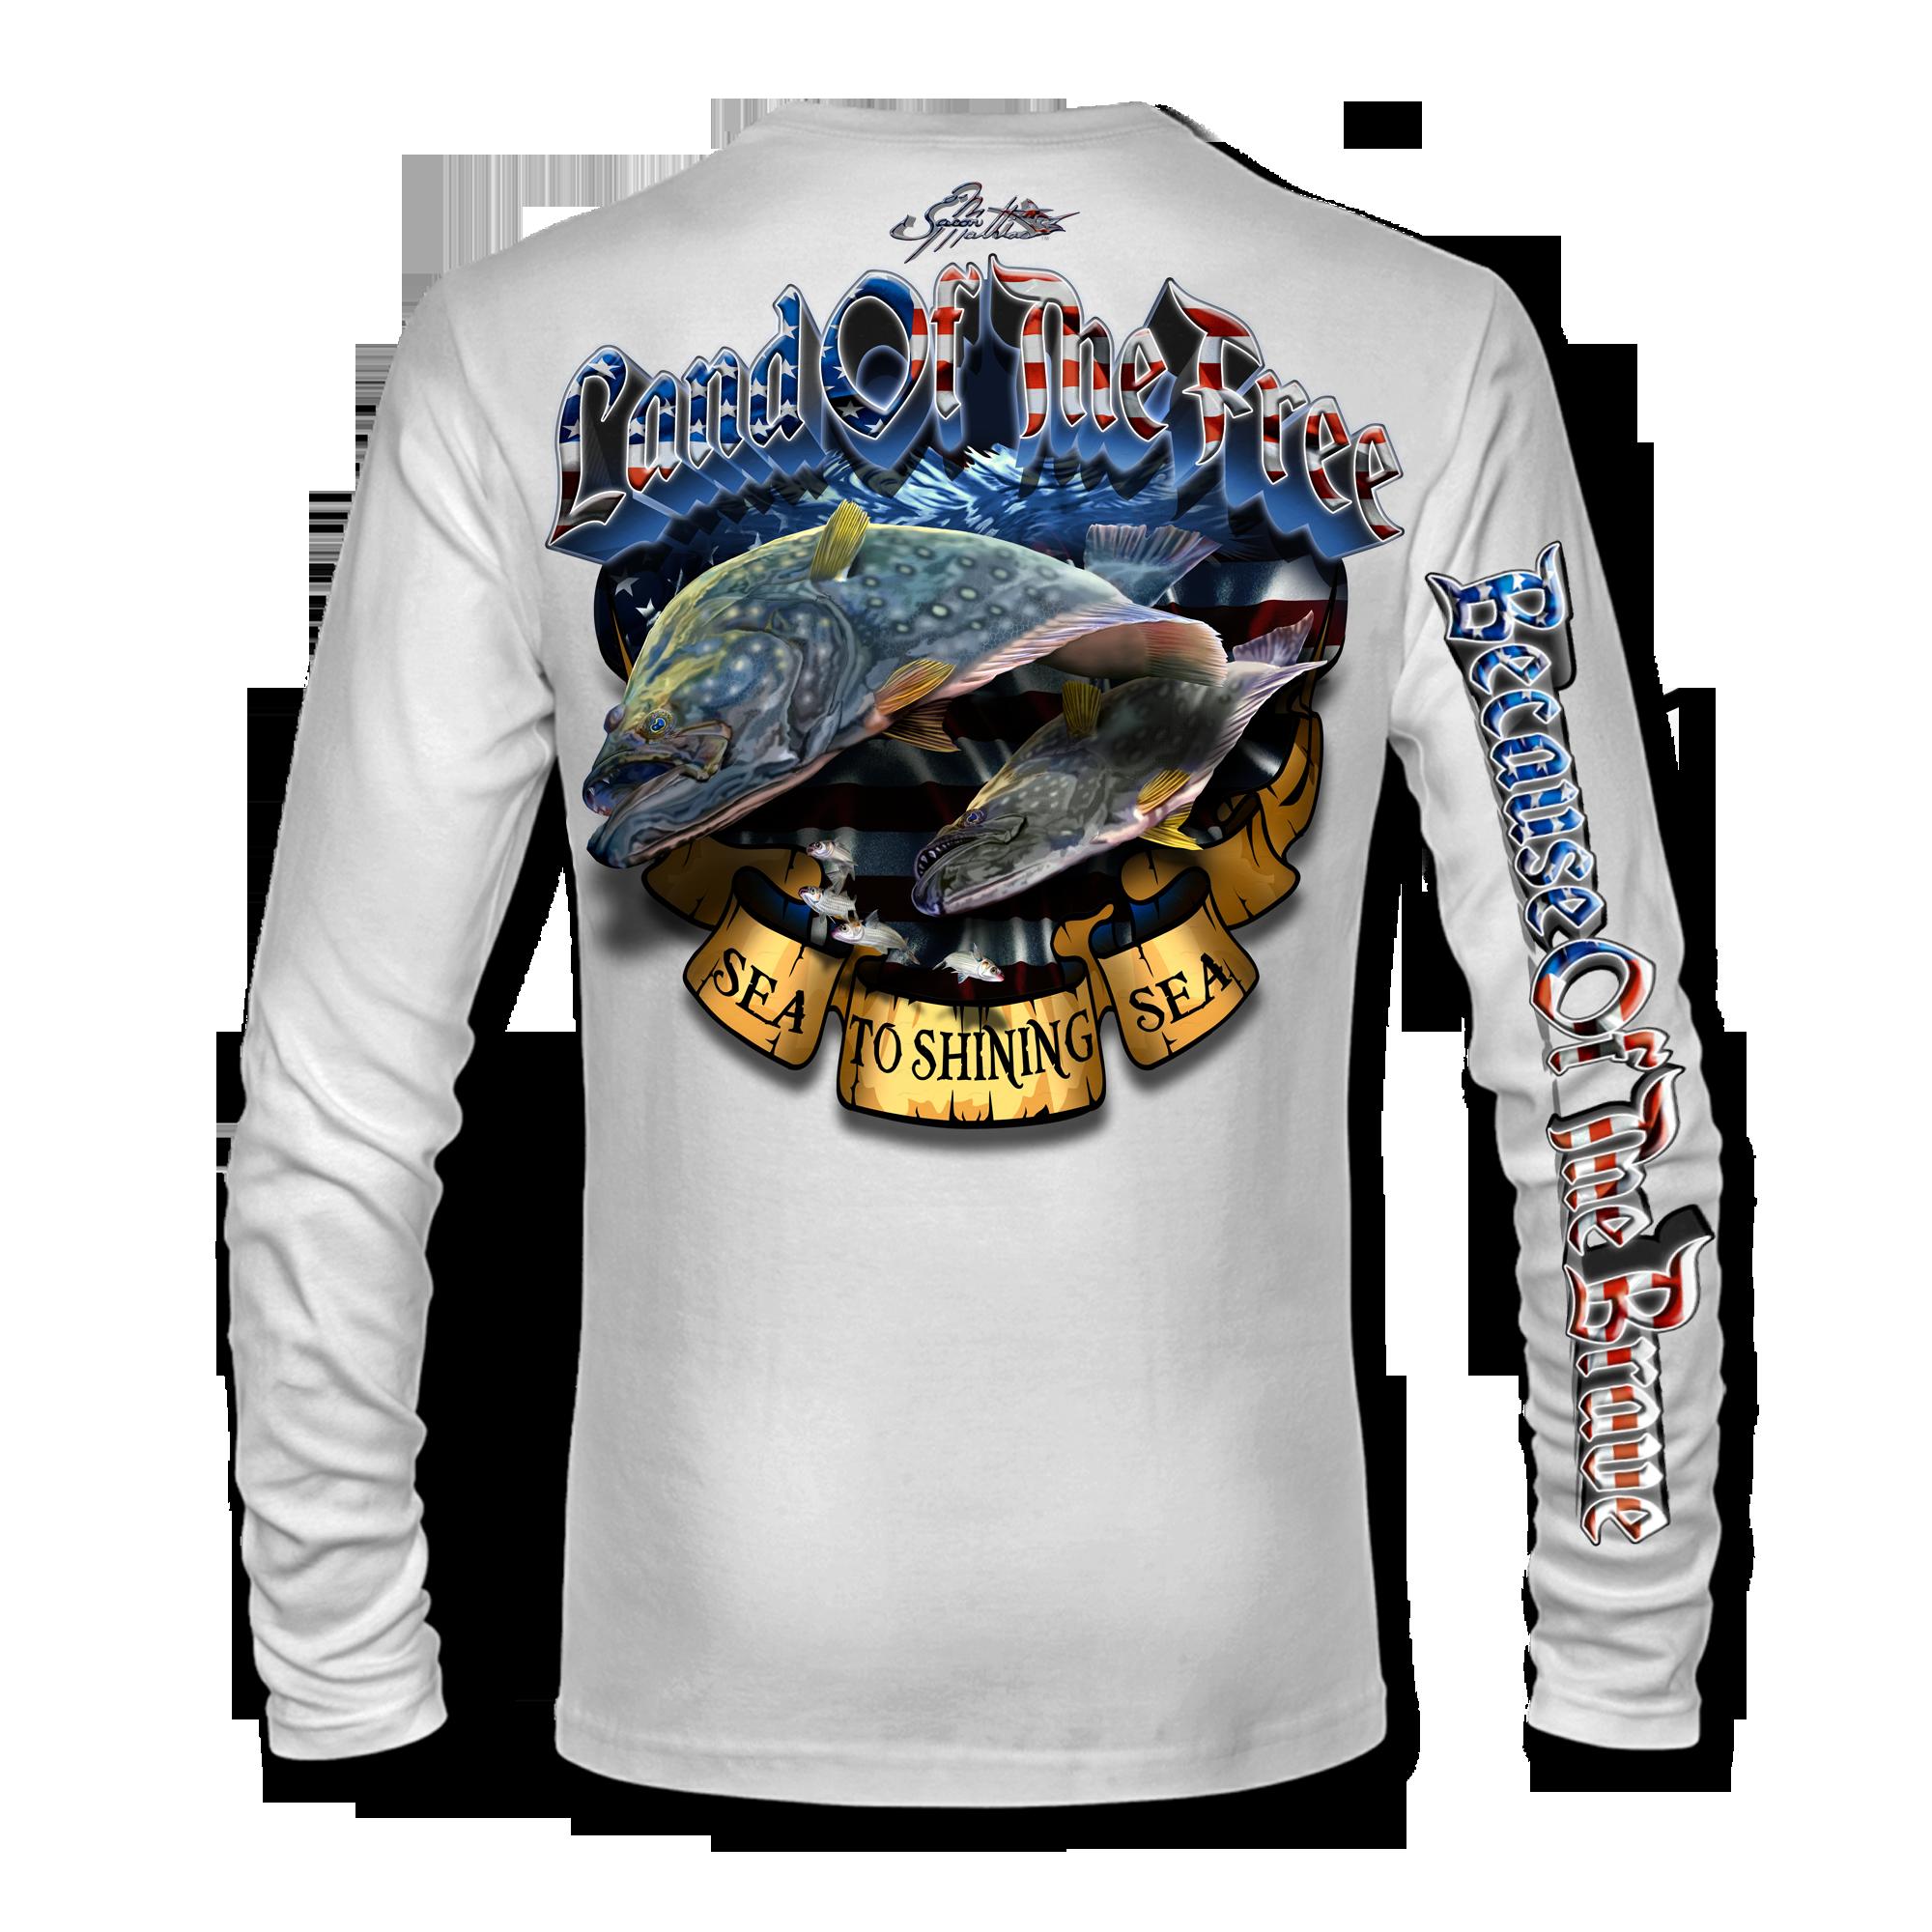 jason-mathias-fluke-flounder-flatfish-summer-winter-shirt-white.png